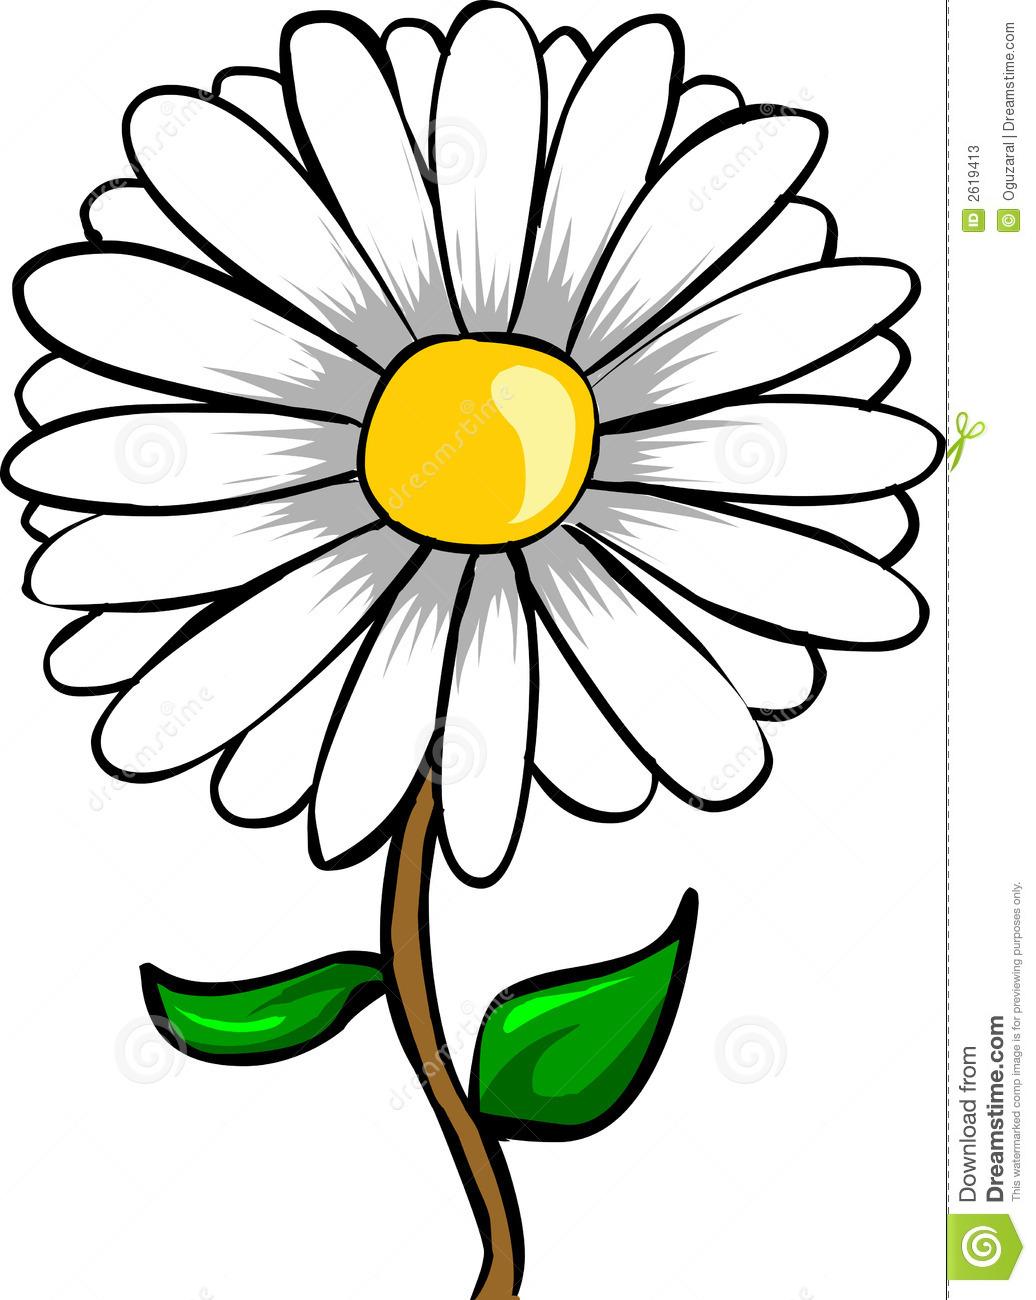 Daisy Clipart Daisy-Daisy Clipart Daisy-14